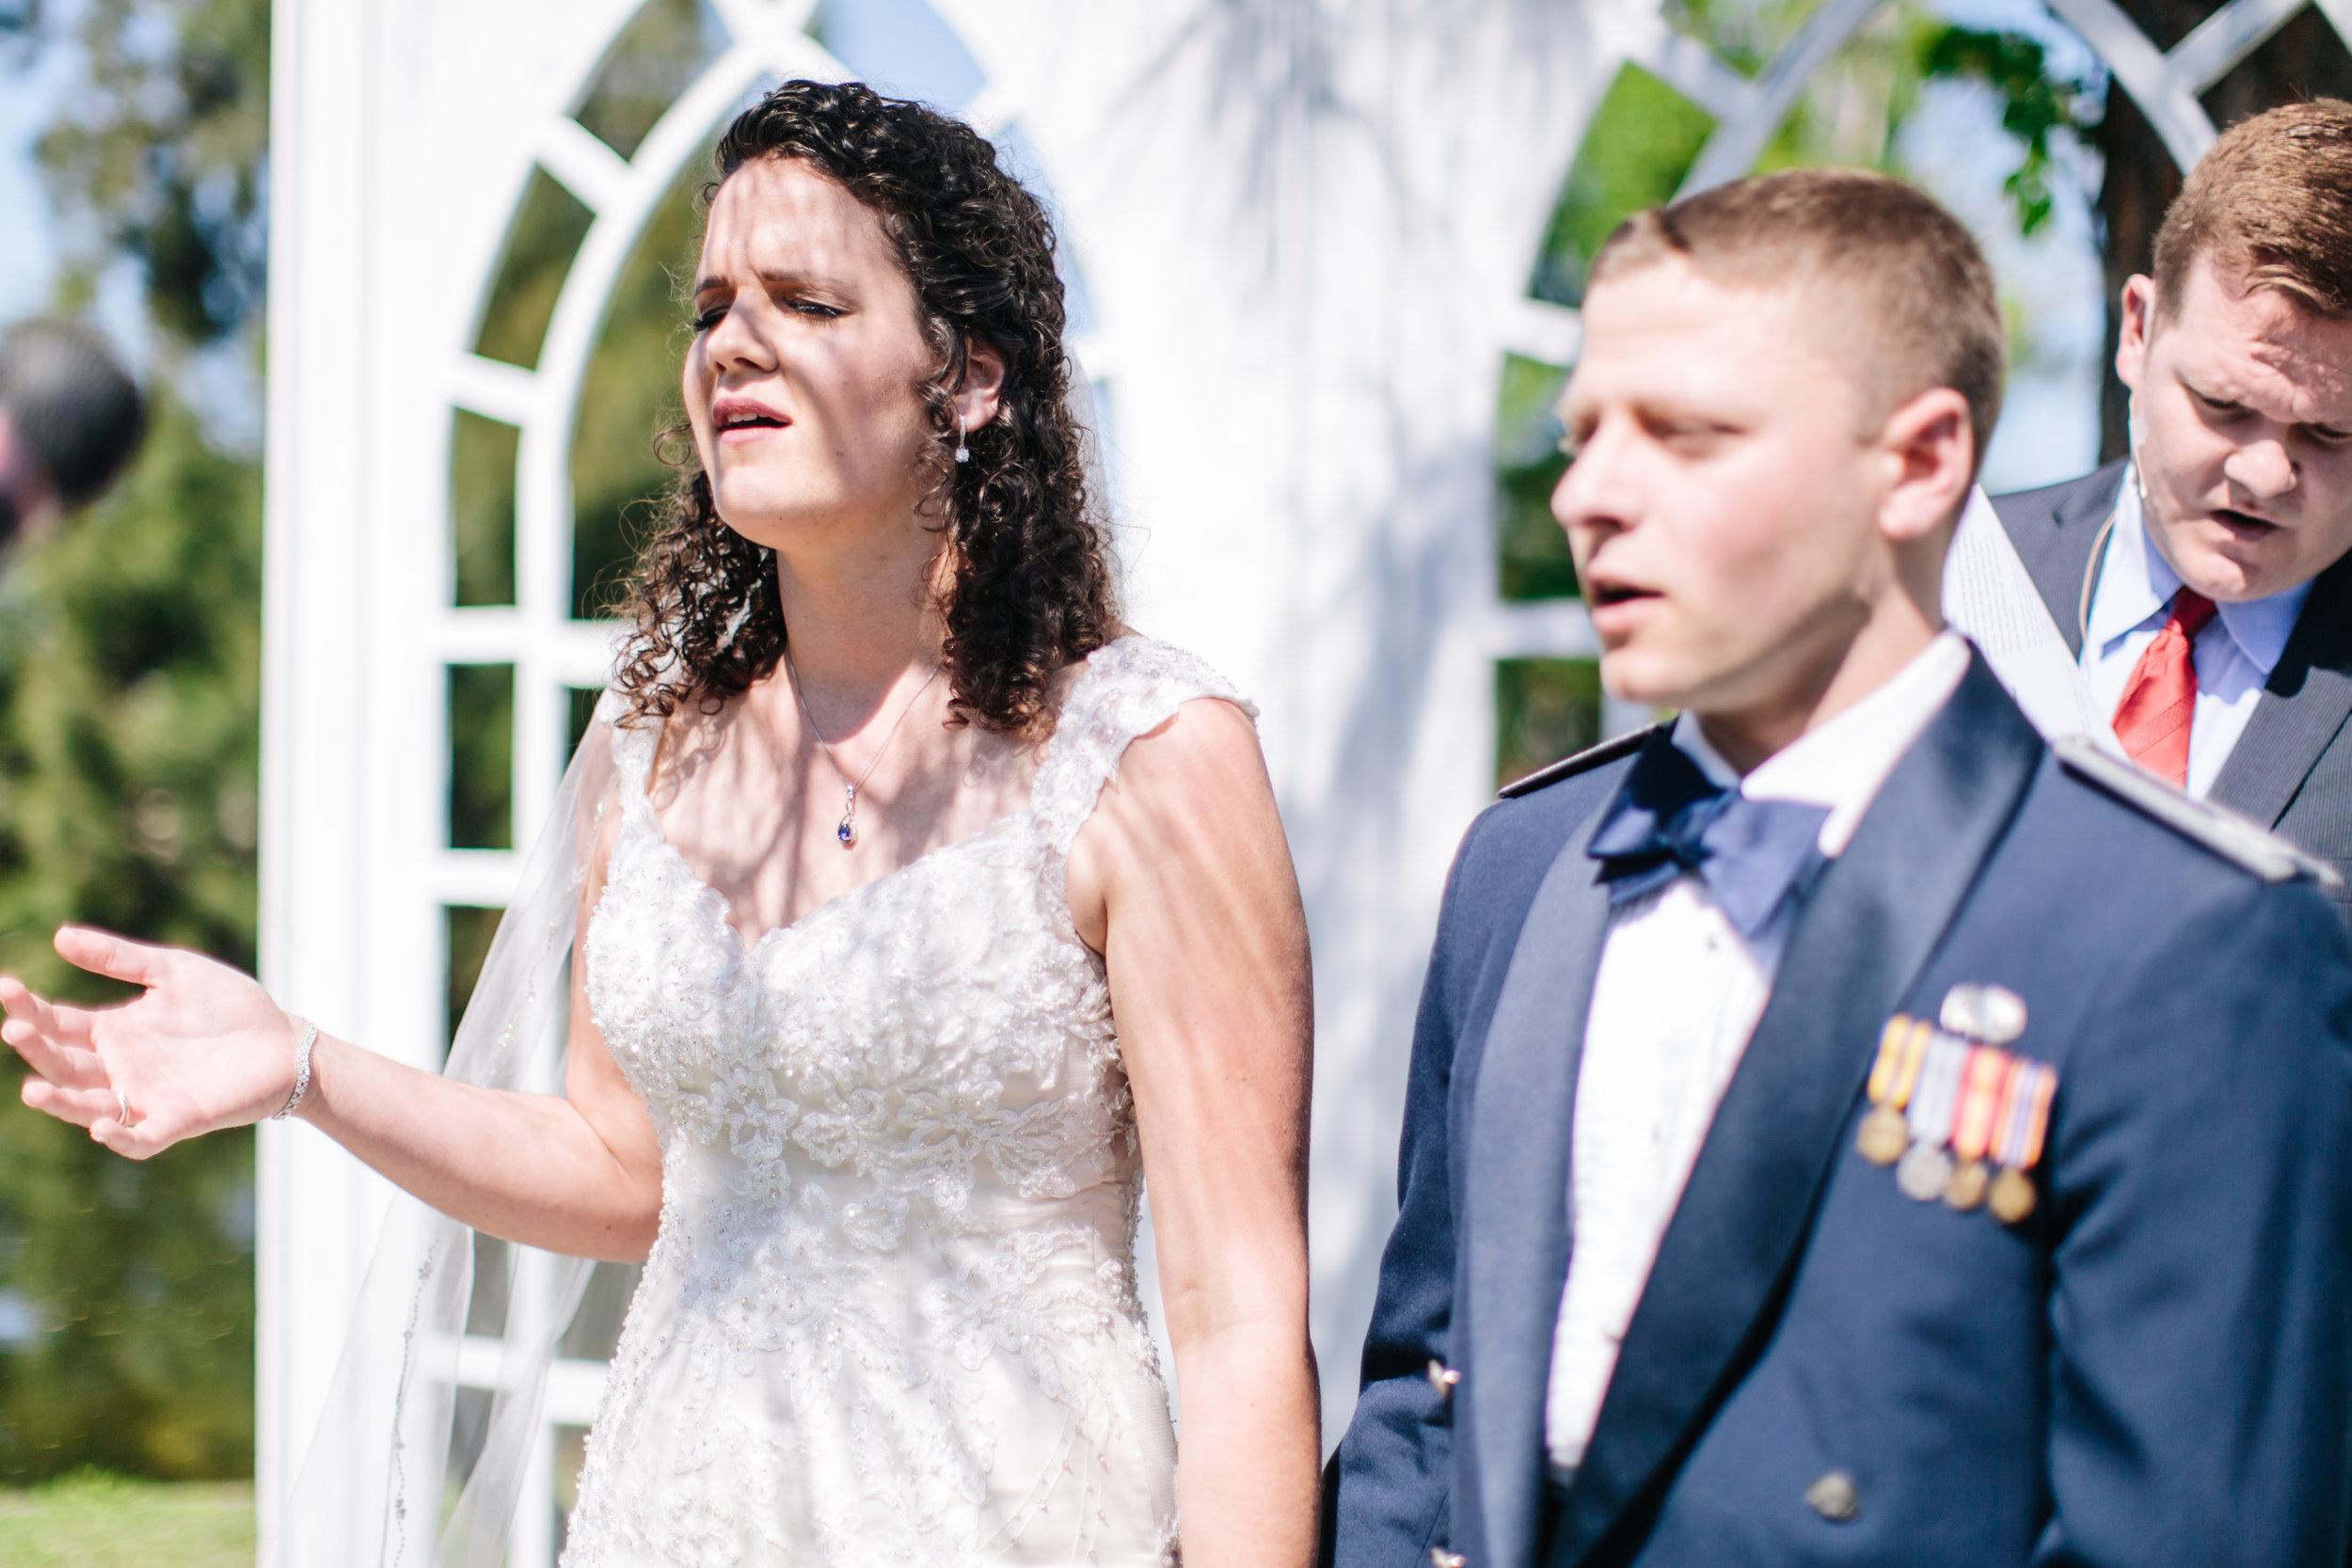 2018.03.17 Allison and Chuck Wedding Waelti Melbourne (270 of 900).jpg